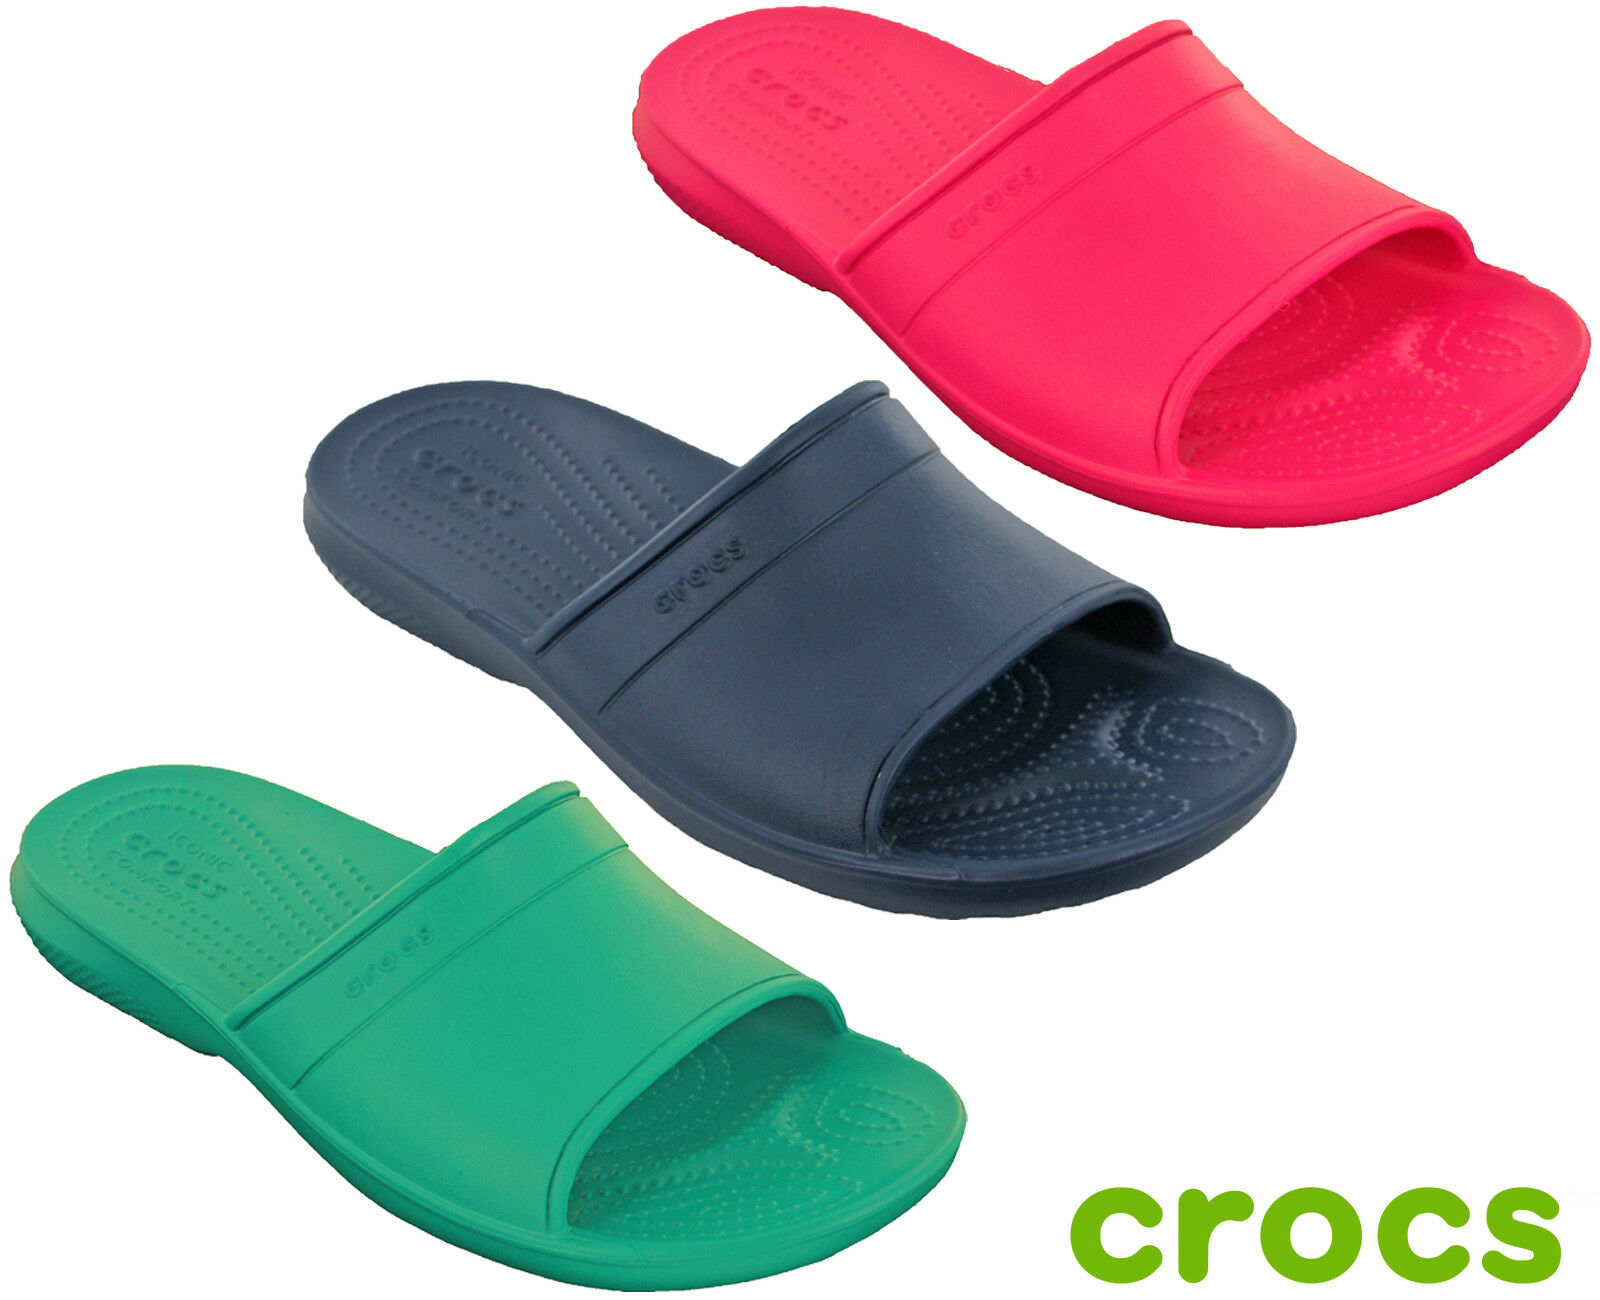 Details zu Crocs Classic Slide Sandals Open Toe Womens Lightweight Flat Cushioned Padded